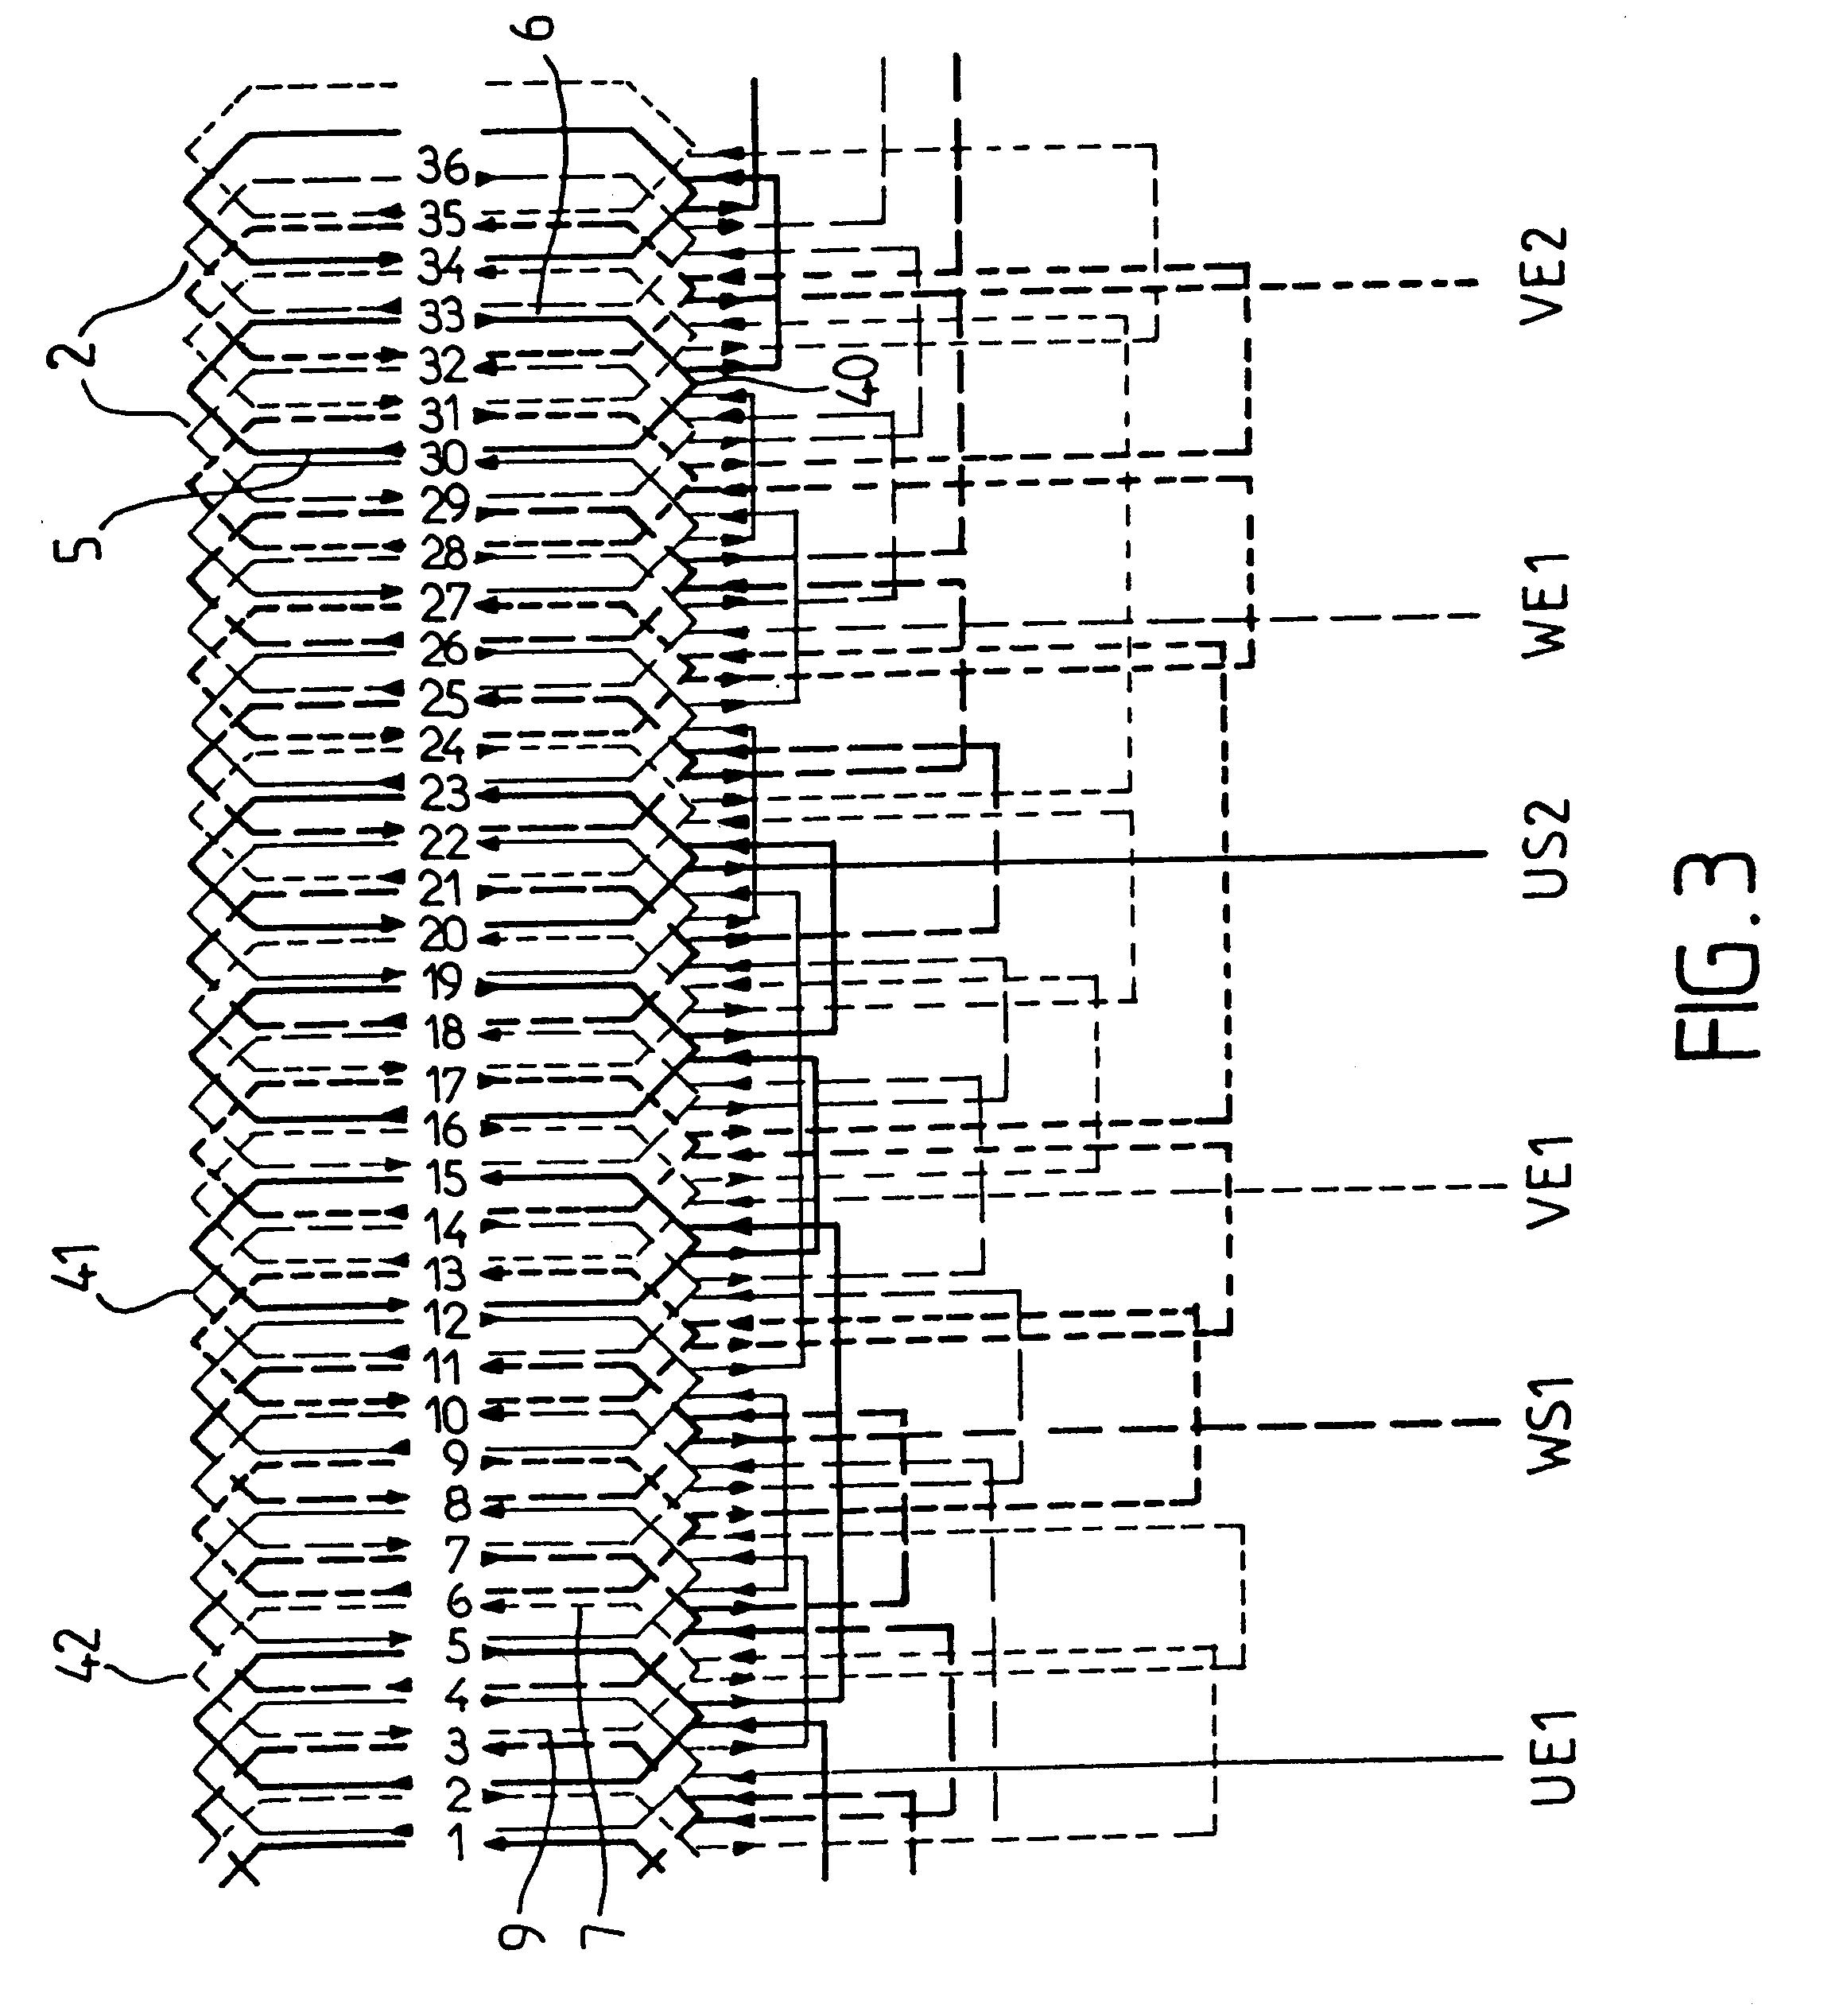 3 Phase 36 Slot Motor Winding Diagram - Electrical Wiring Diagram ...